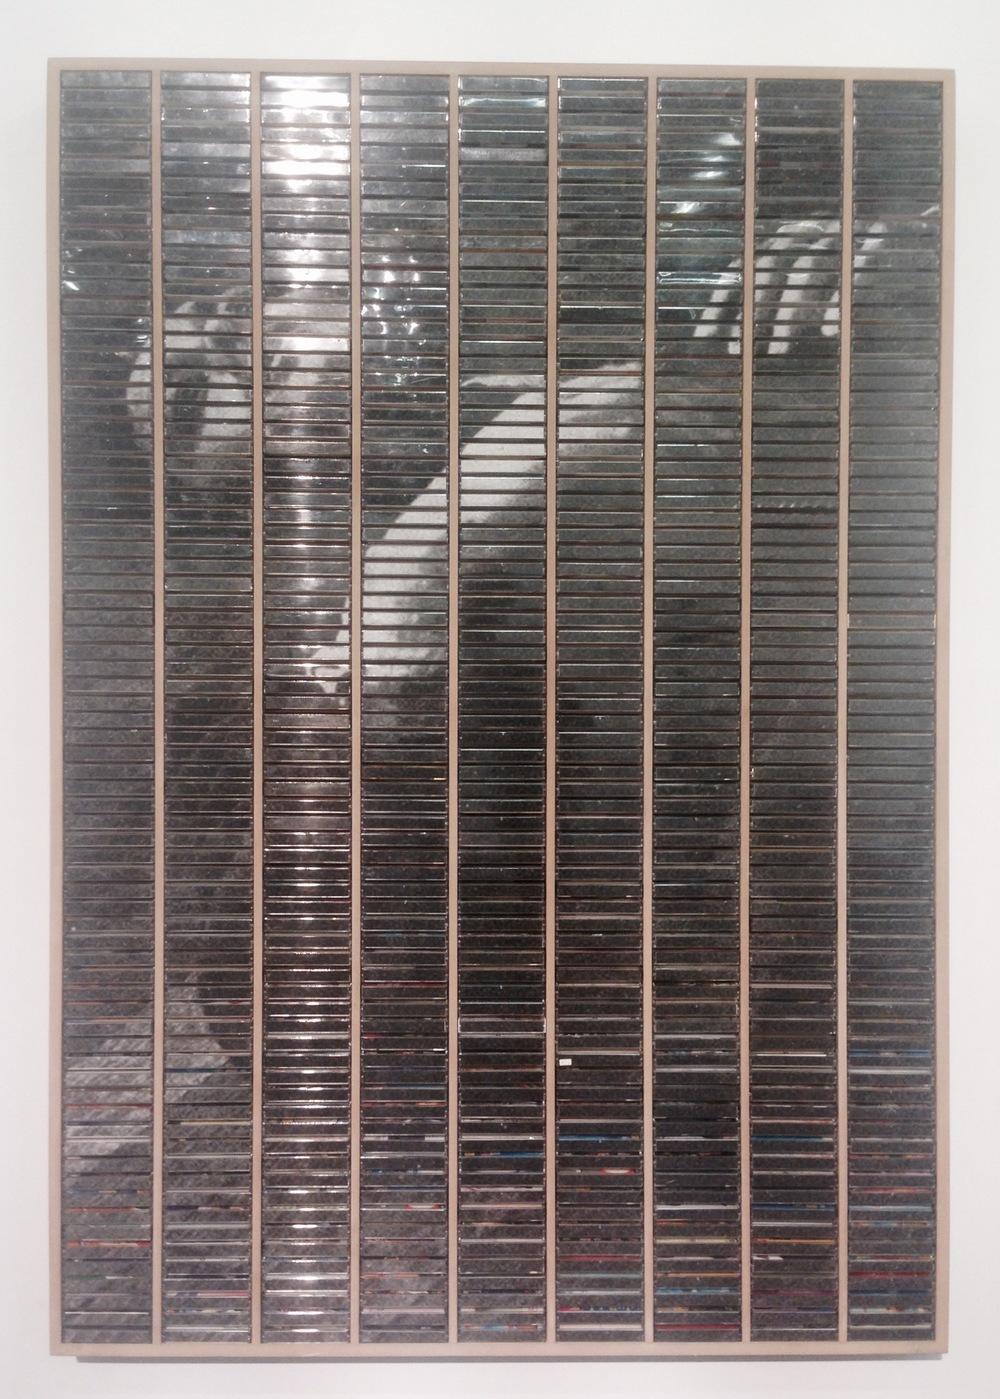 Gregor Hilderbrandt  The Queen Is Dead, 2015 Inkjet print, plastic cassette tape boxes in wooded case